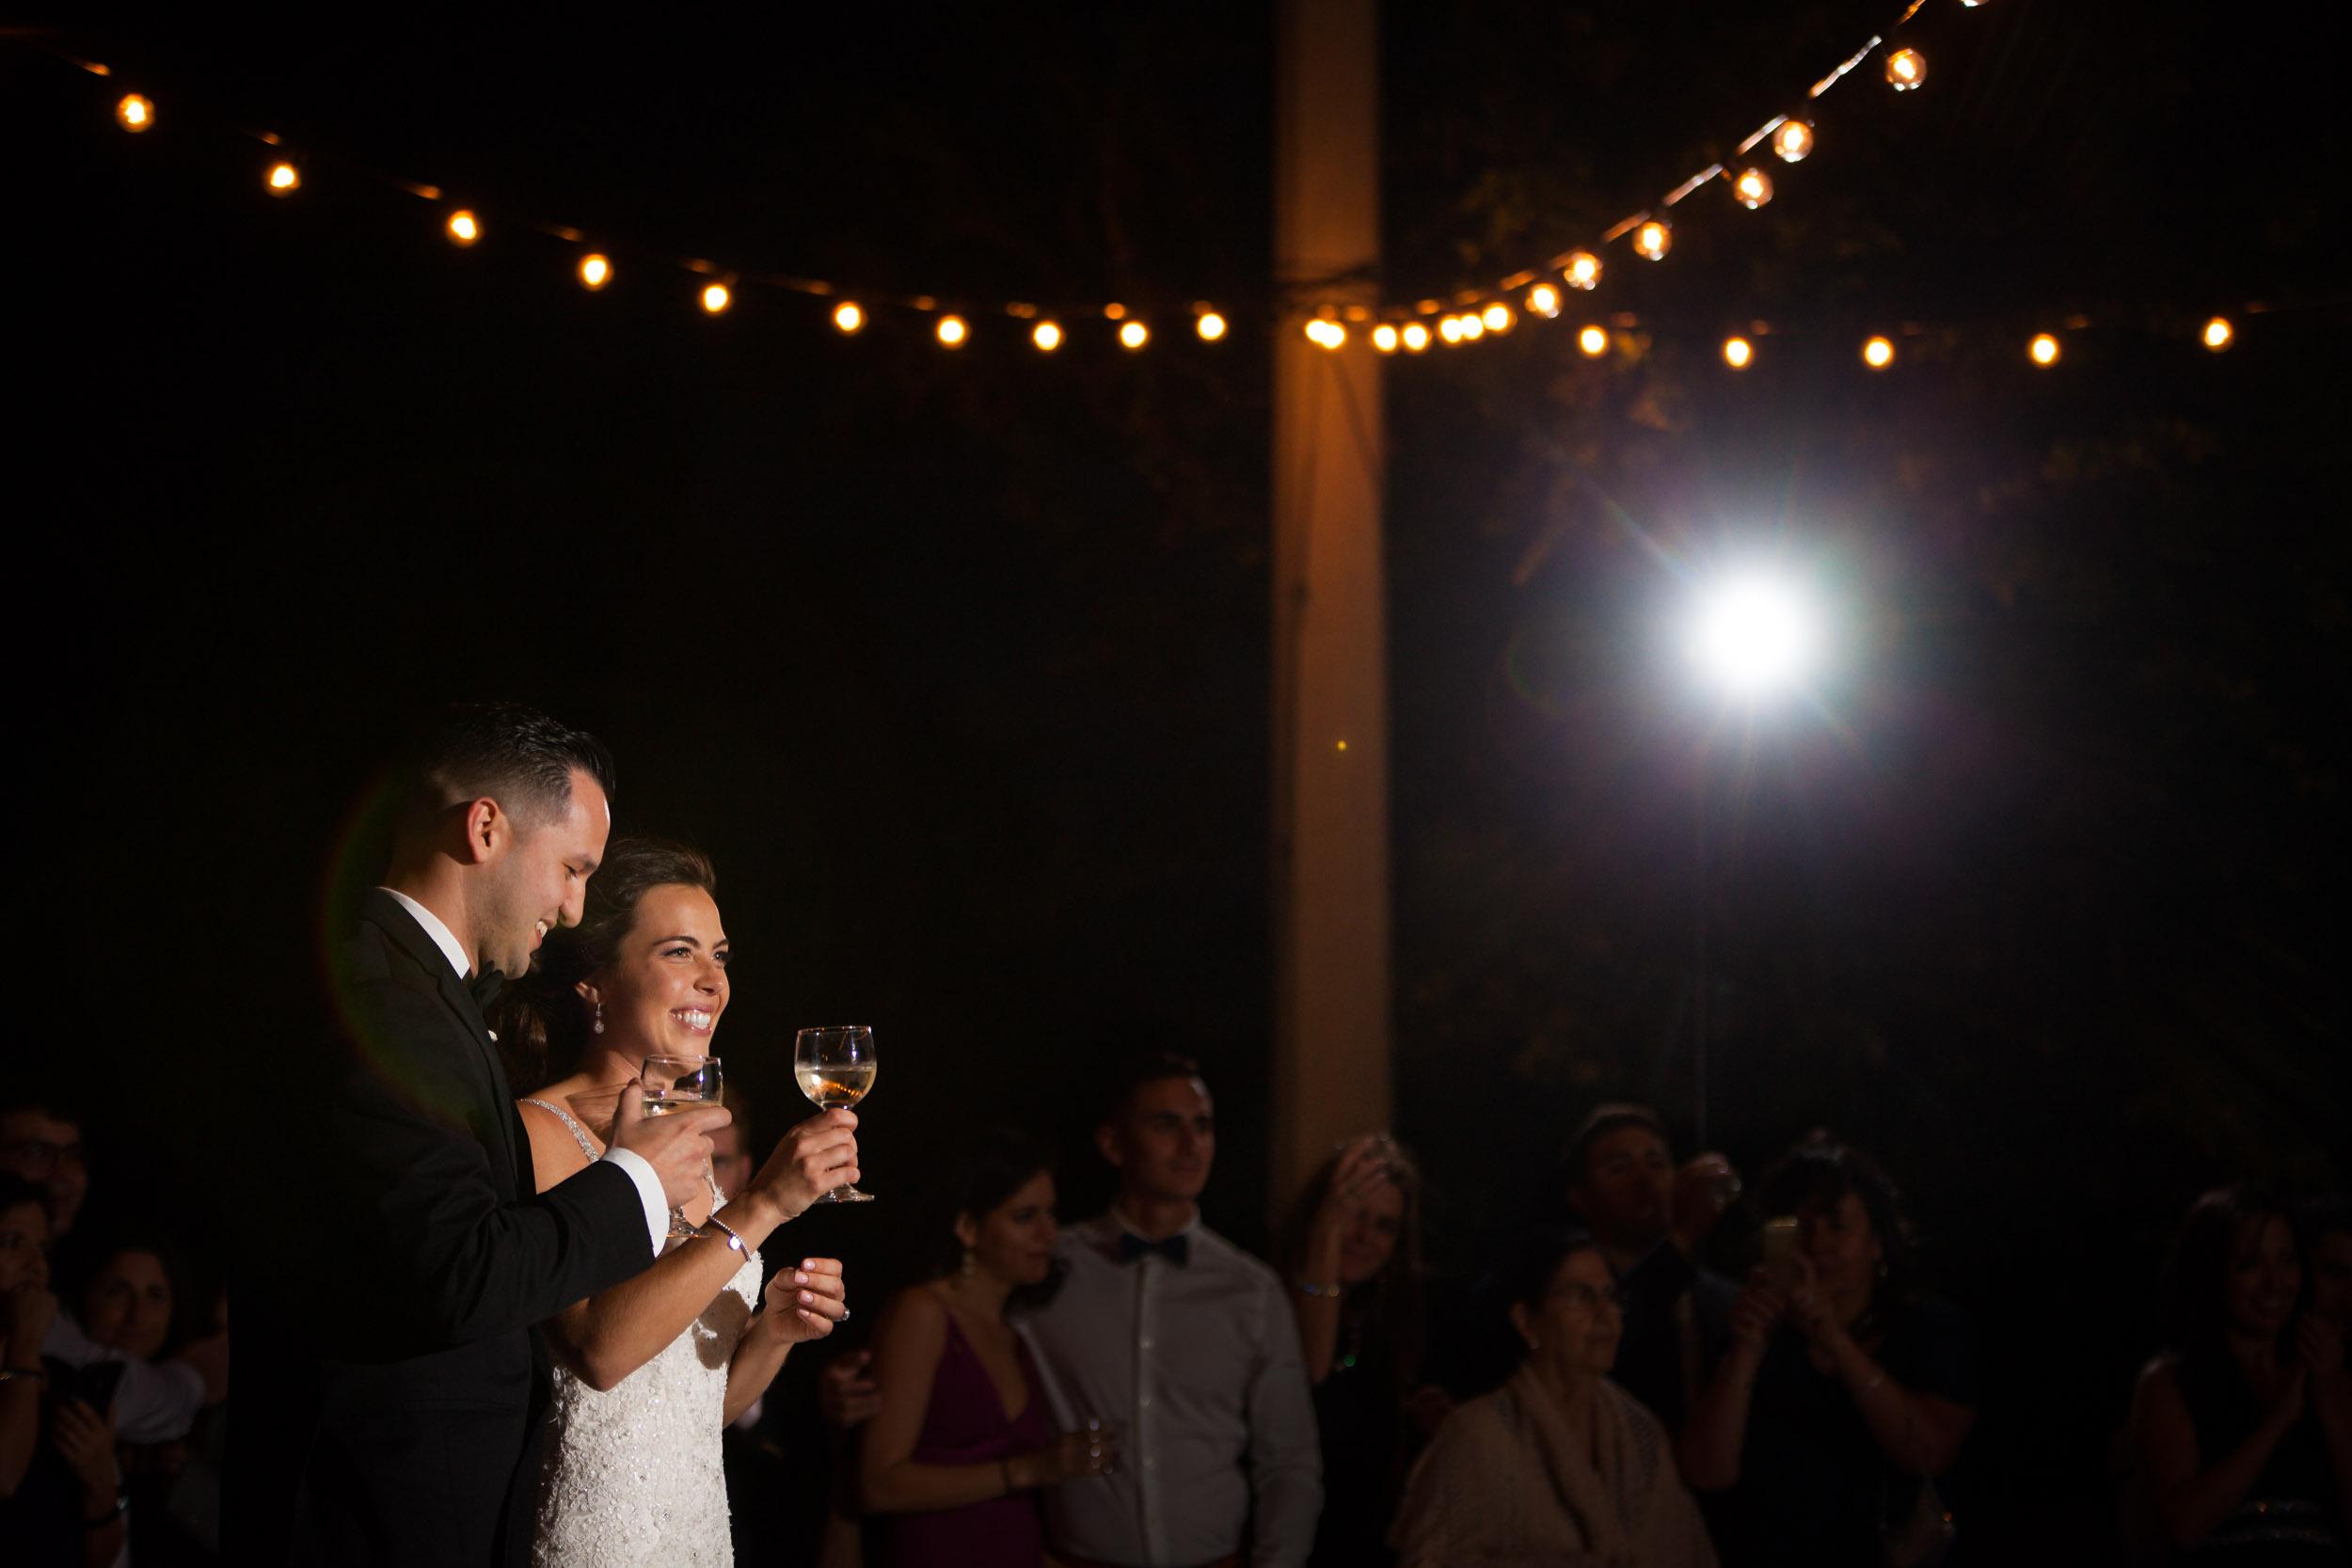 Flordia-Wedding-Photography-63.jpg